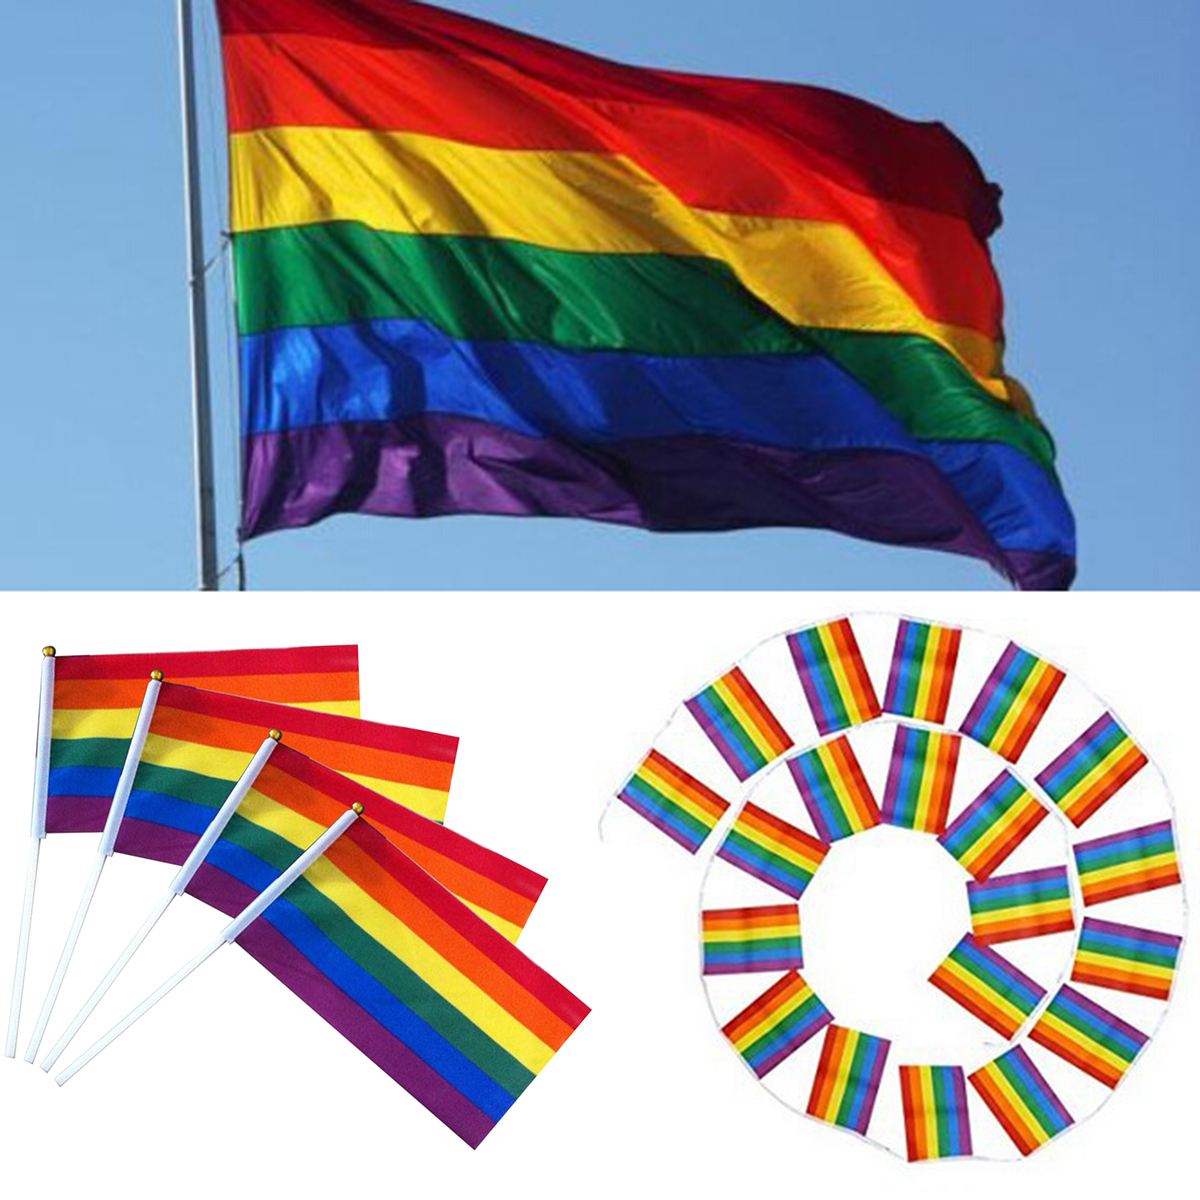 12pcs/set Rainbow Flag Colorful Rainbow Peace Flags Banner LGBT Pride LGBT Flag Lesbian Gay Parade Flags Home Decoration 3 Size